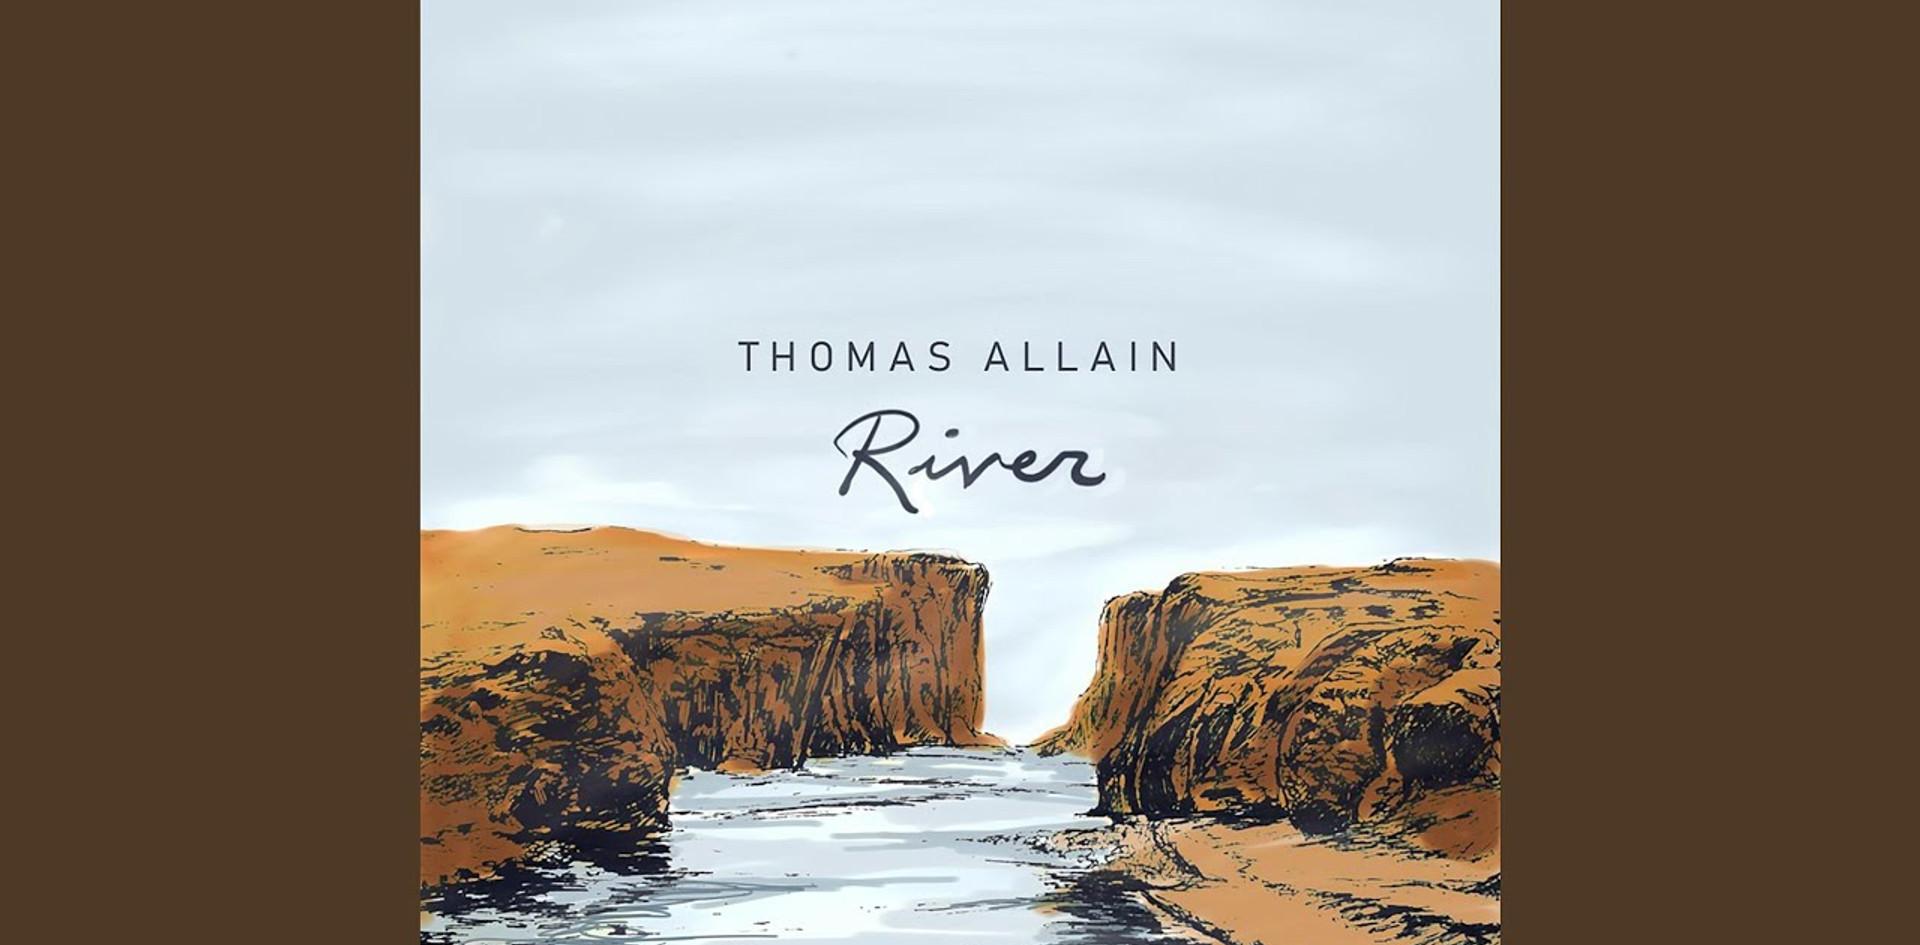 THOMAS ALLAIN — River (original)